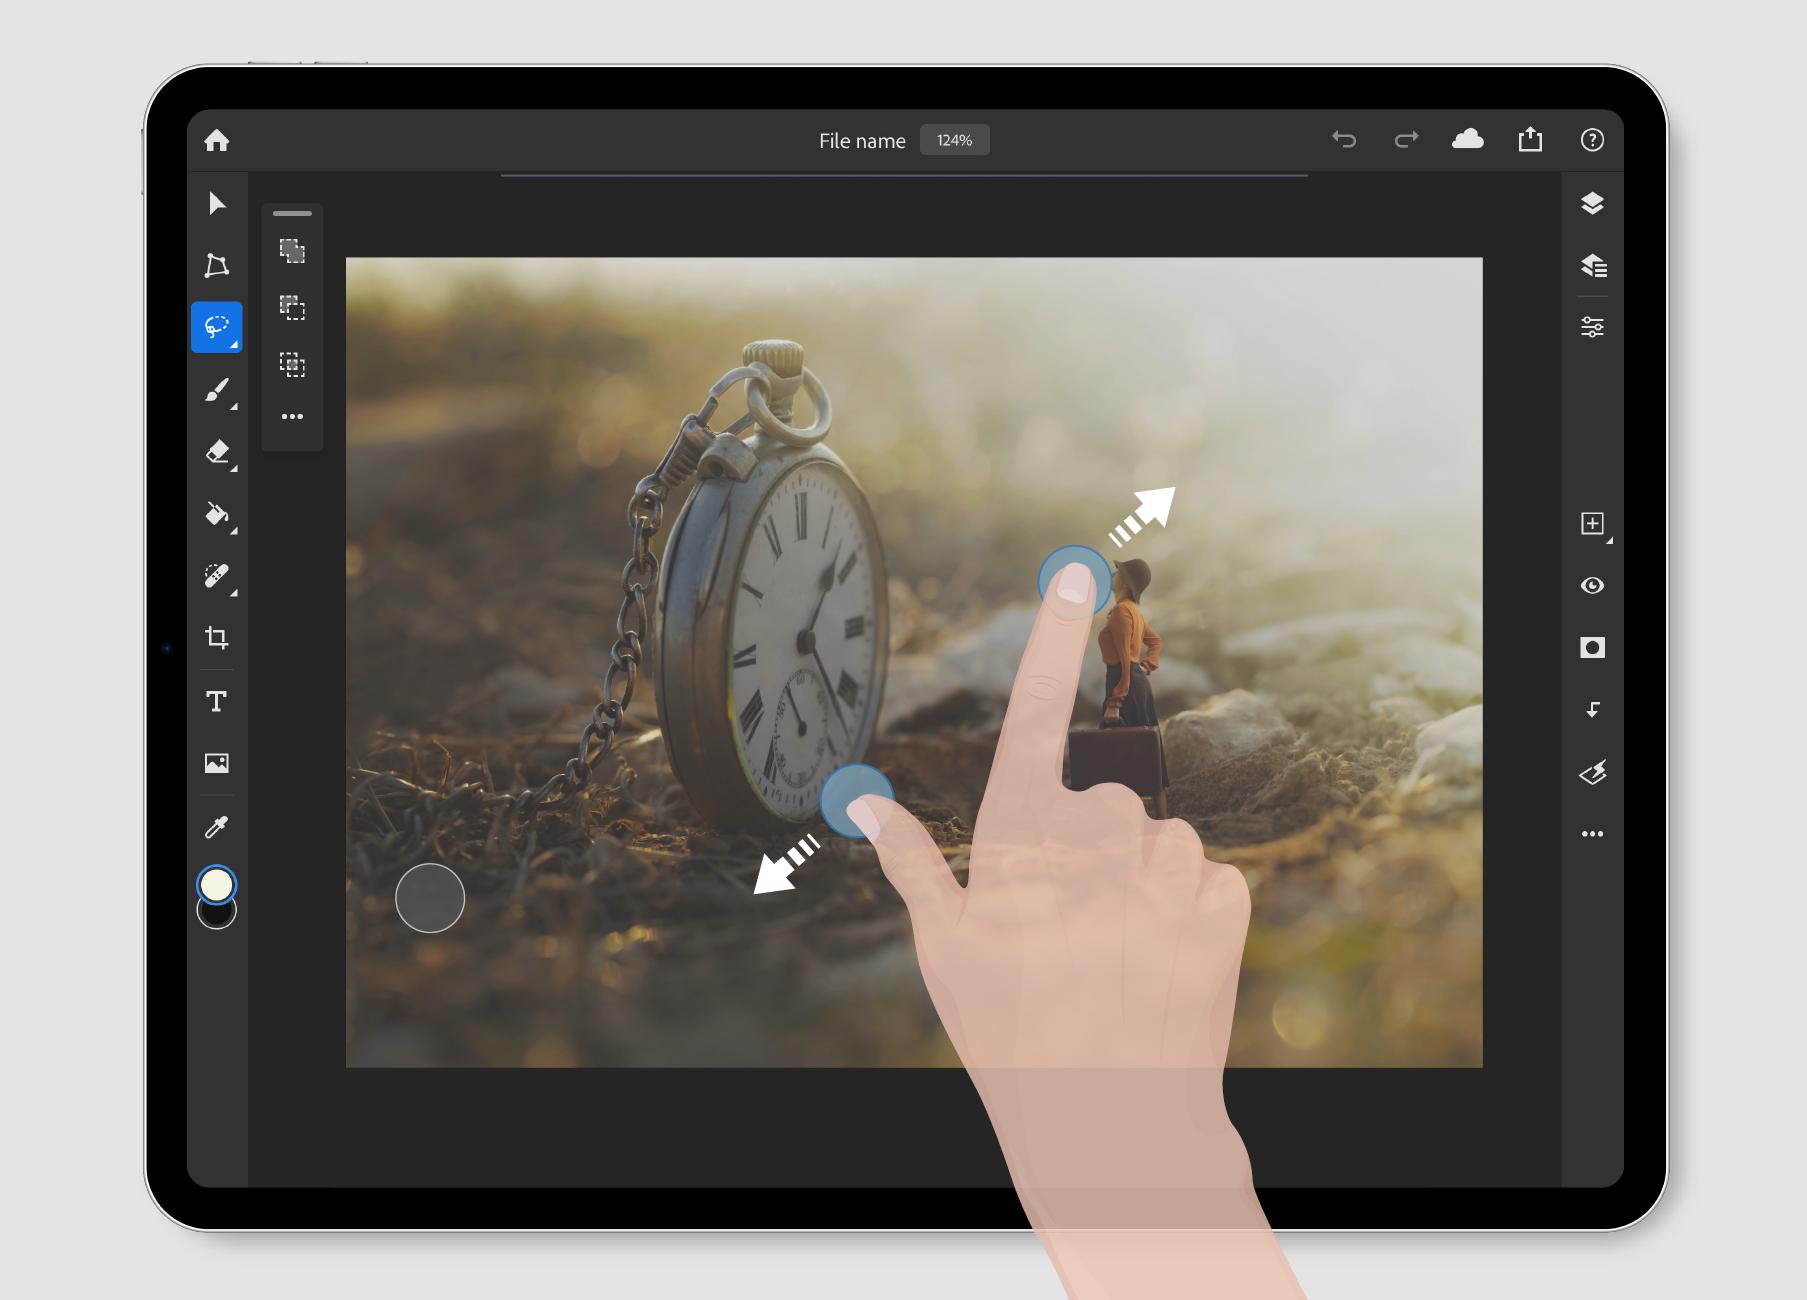 tablete cu fotografii vectoriale varicoase